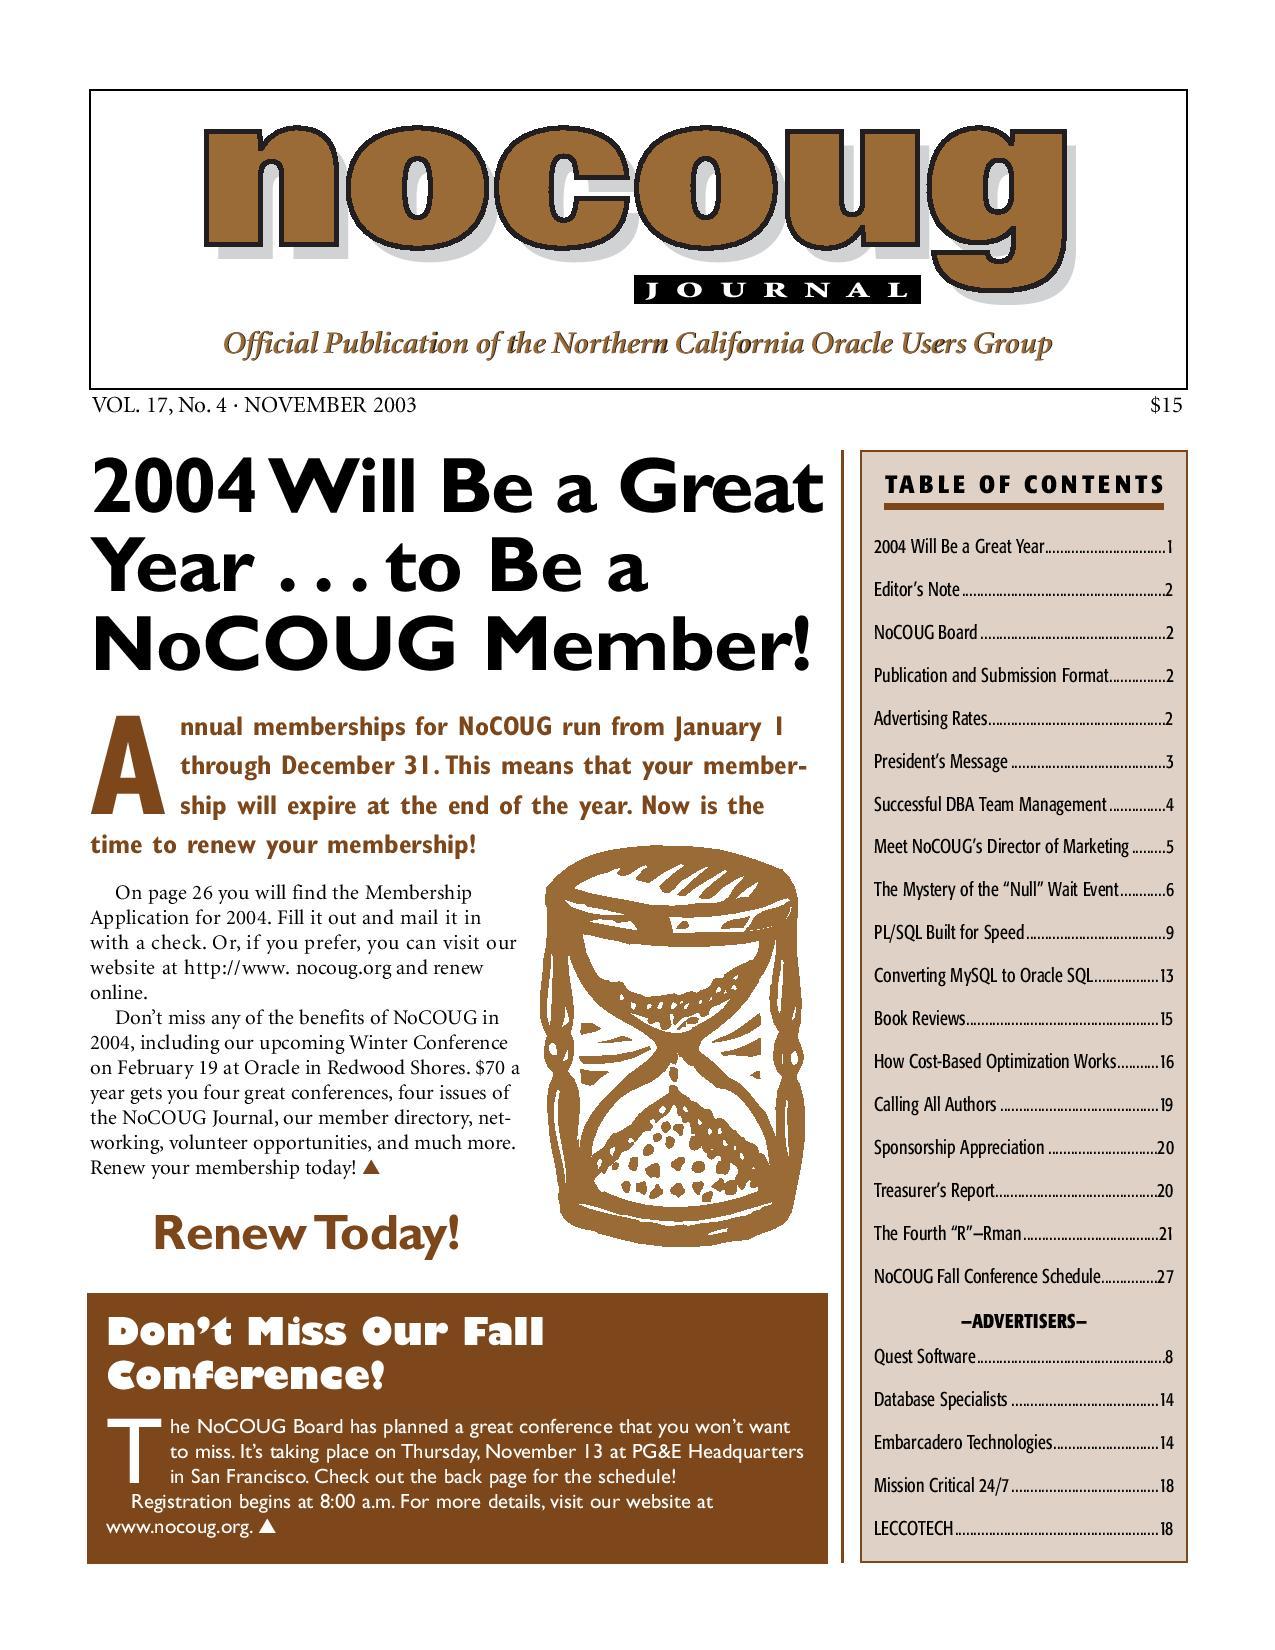 NoCOUG Journal 2003 11